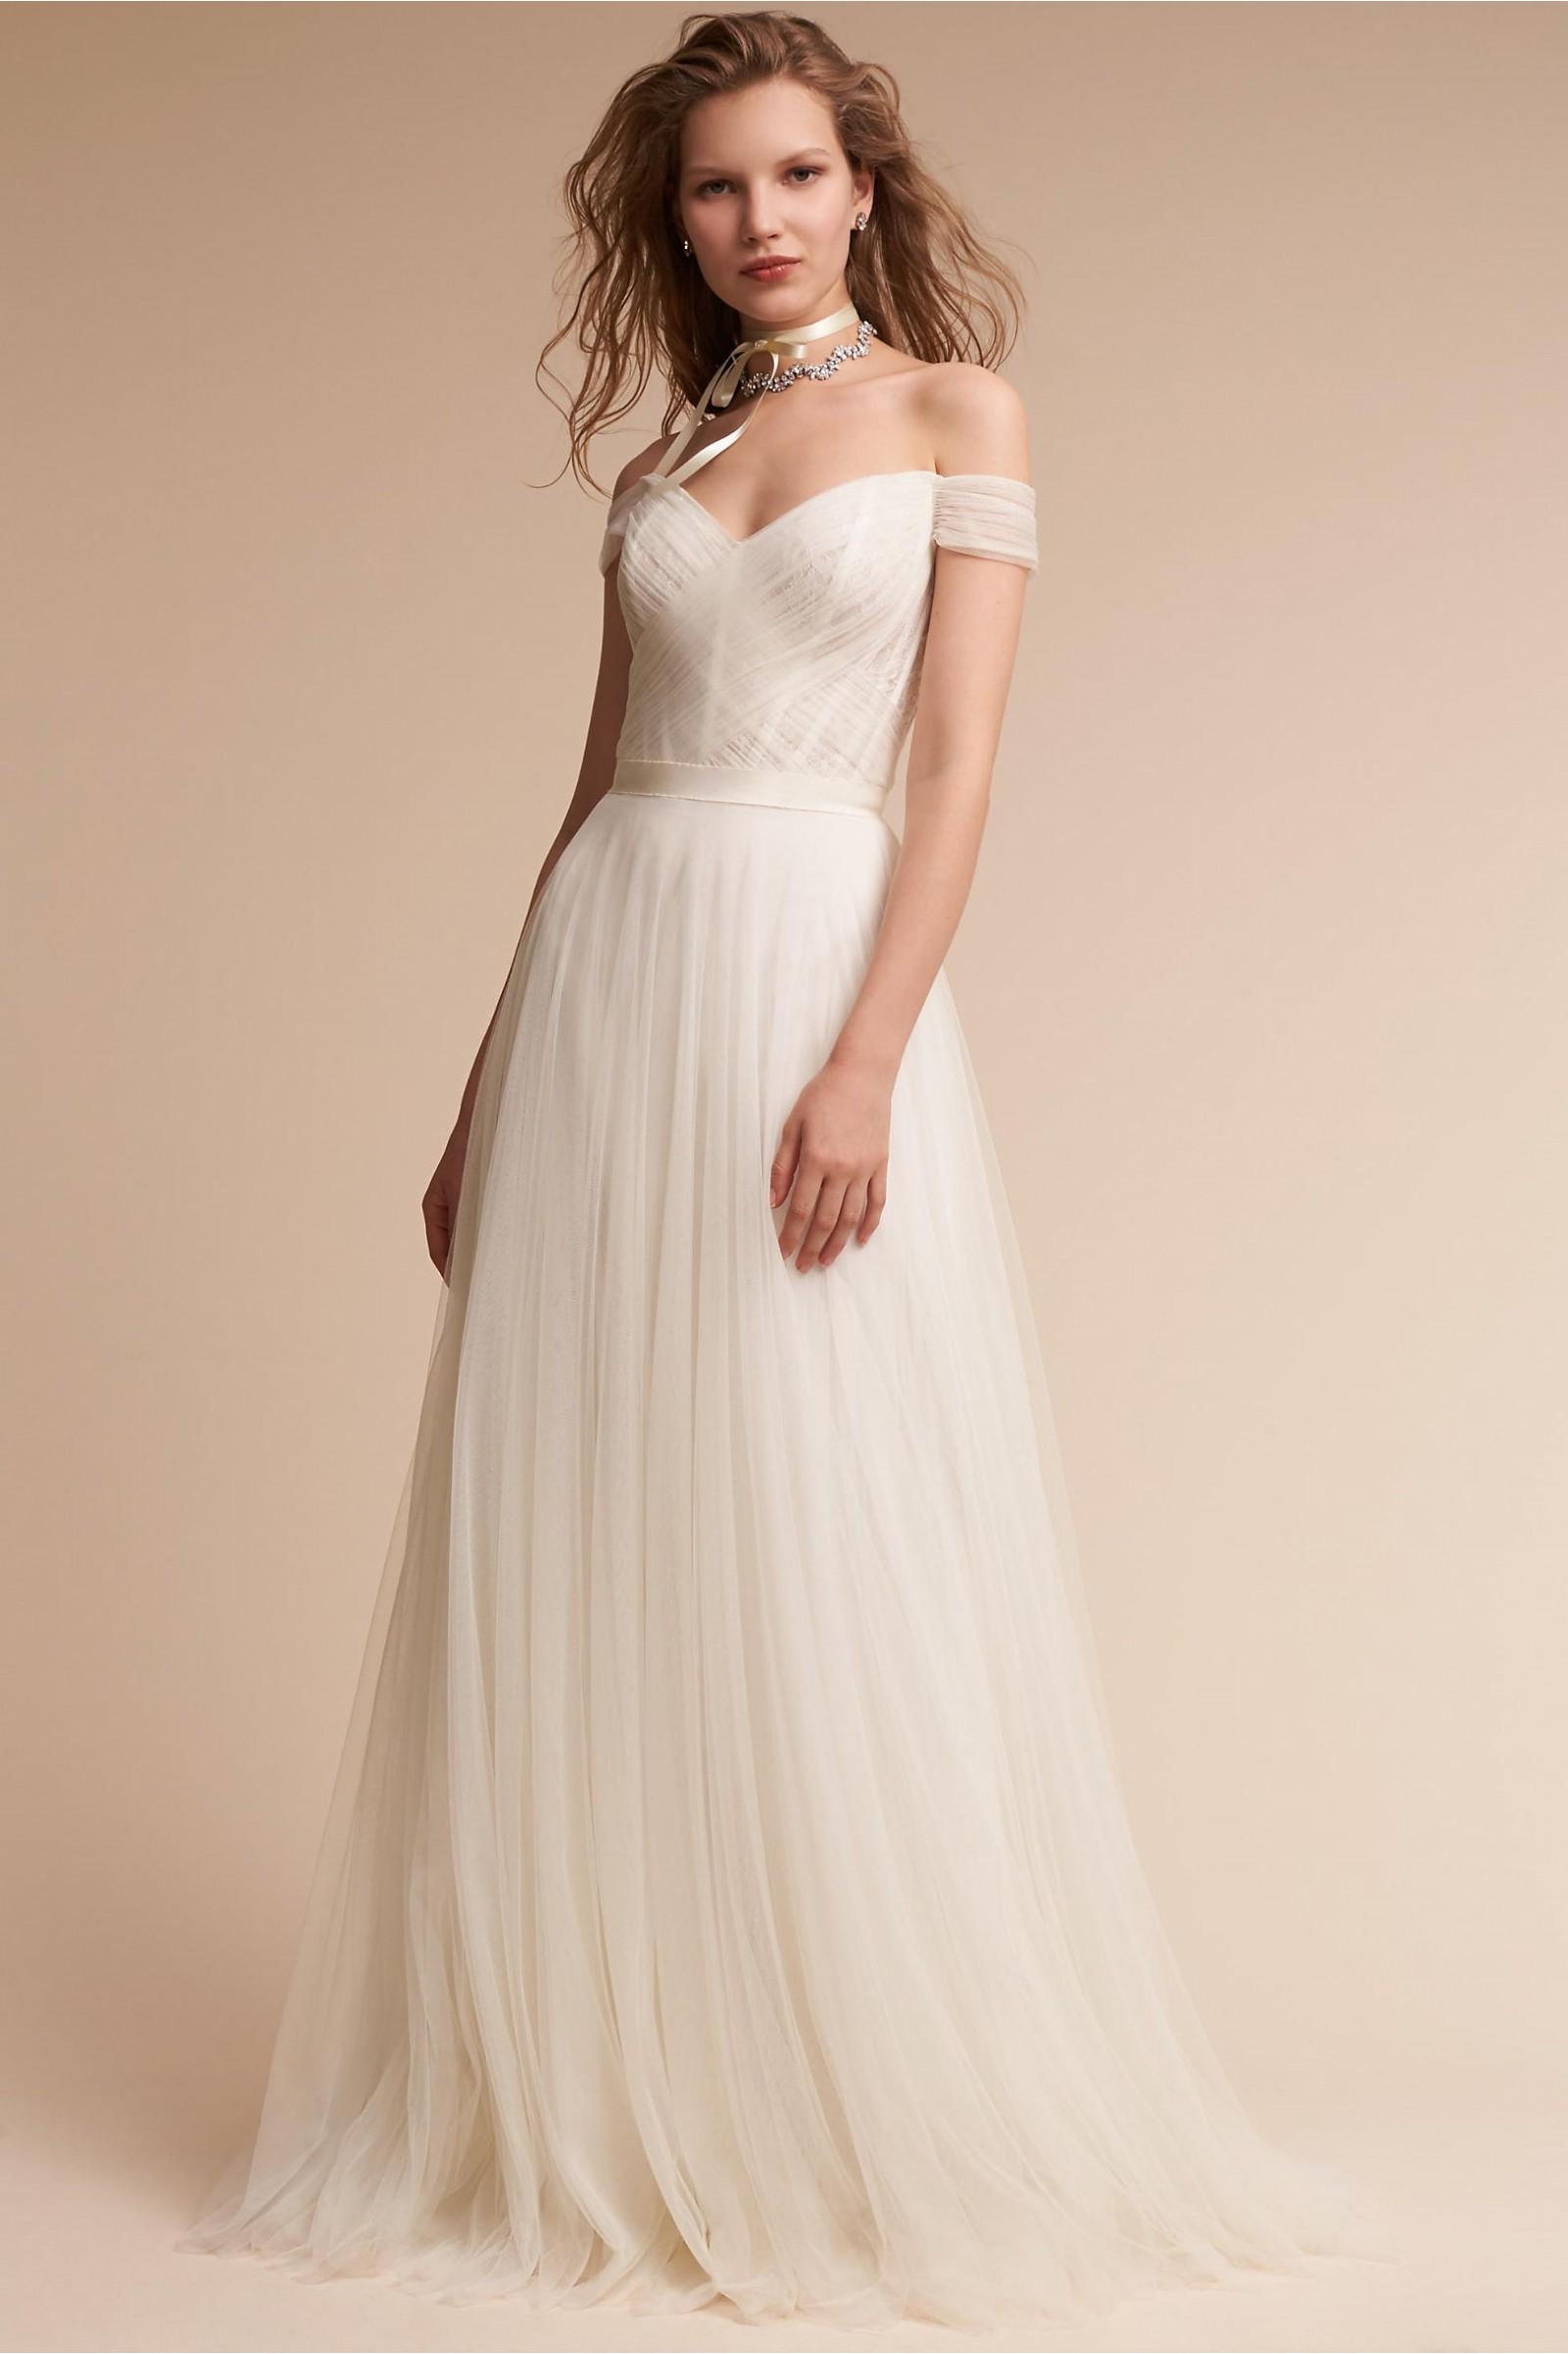 Wtoo Heaton New Wedding Dress on Sale 32% Off - Stillwhite